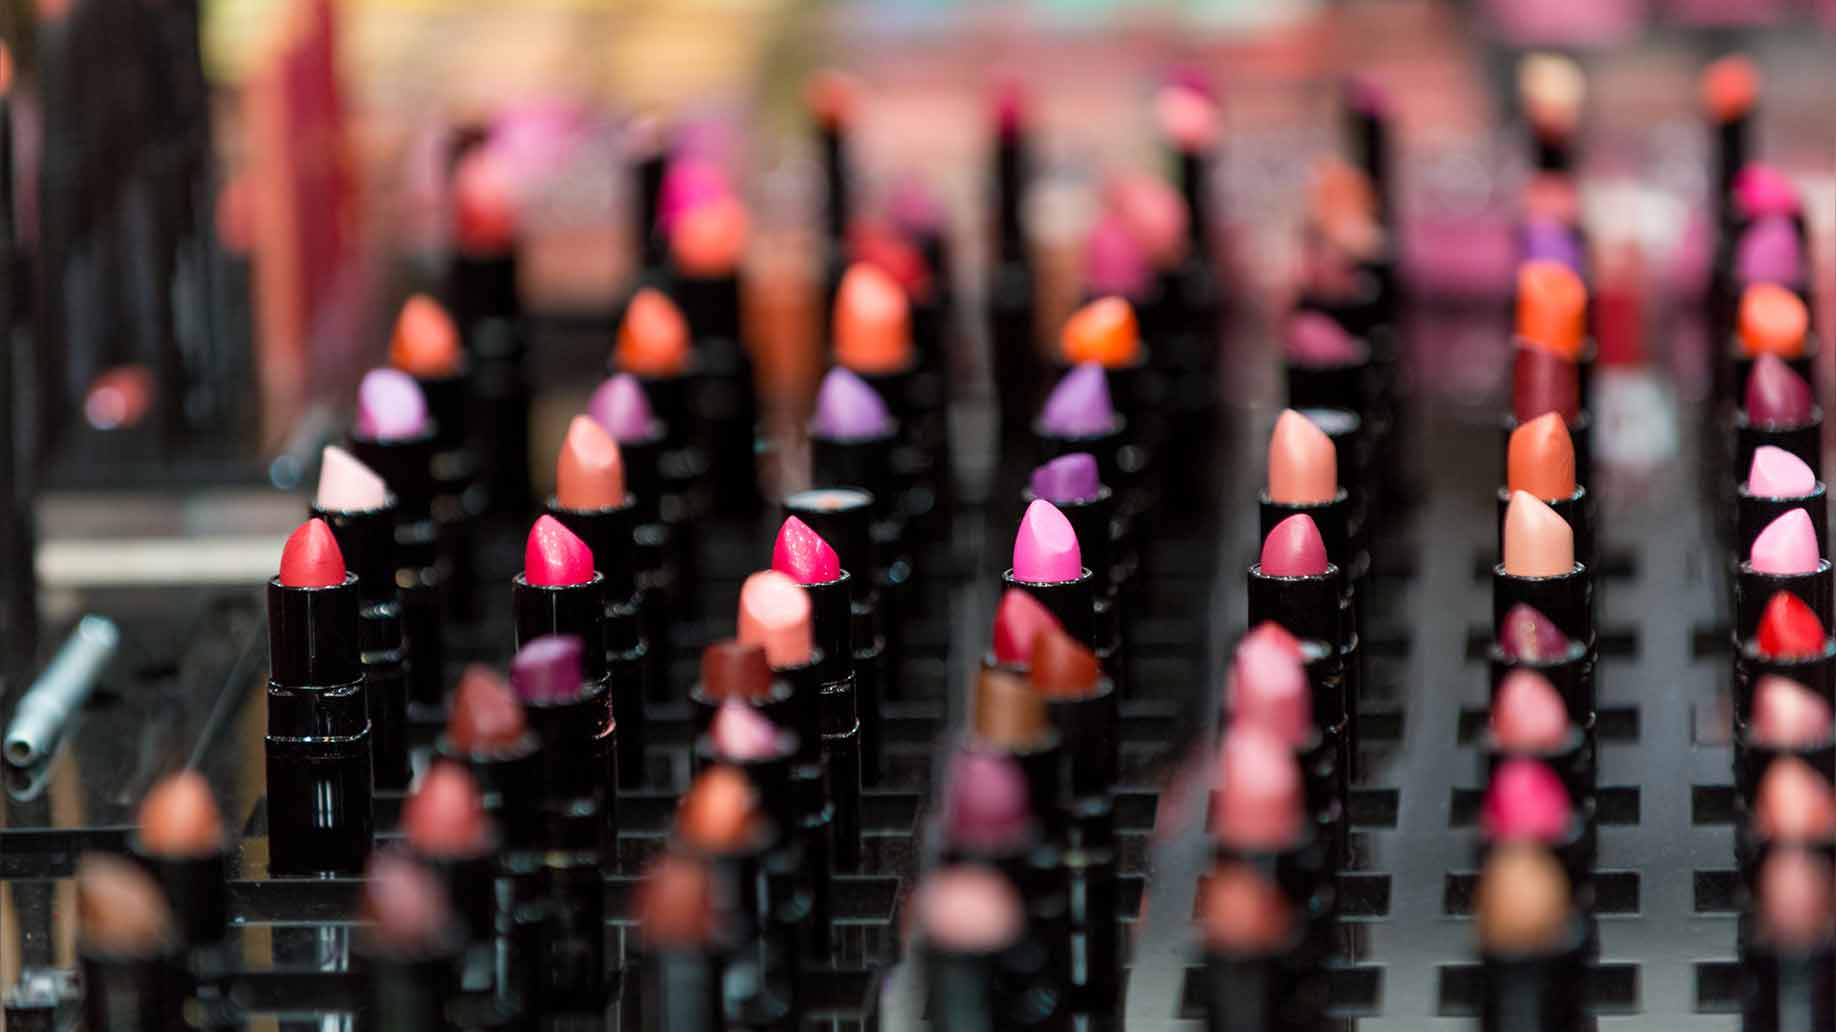 lipstick types